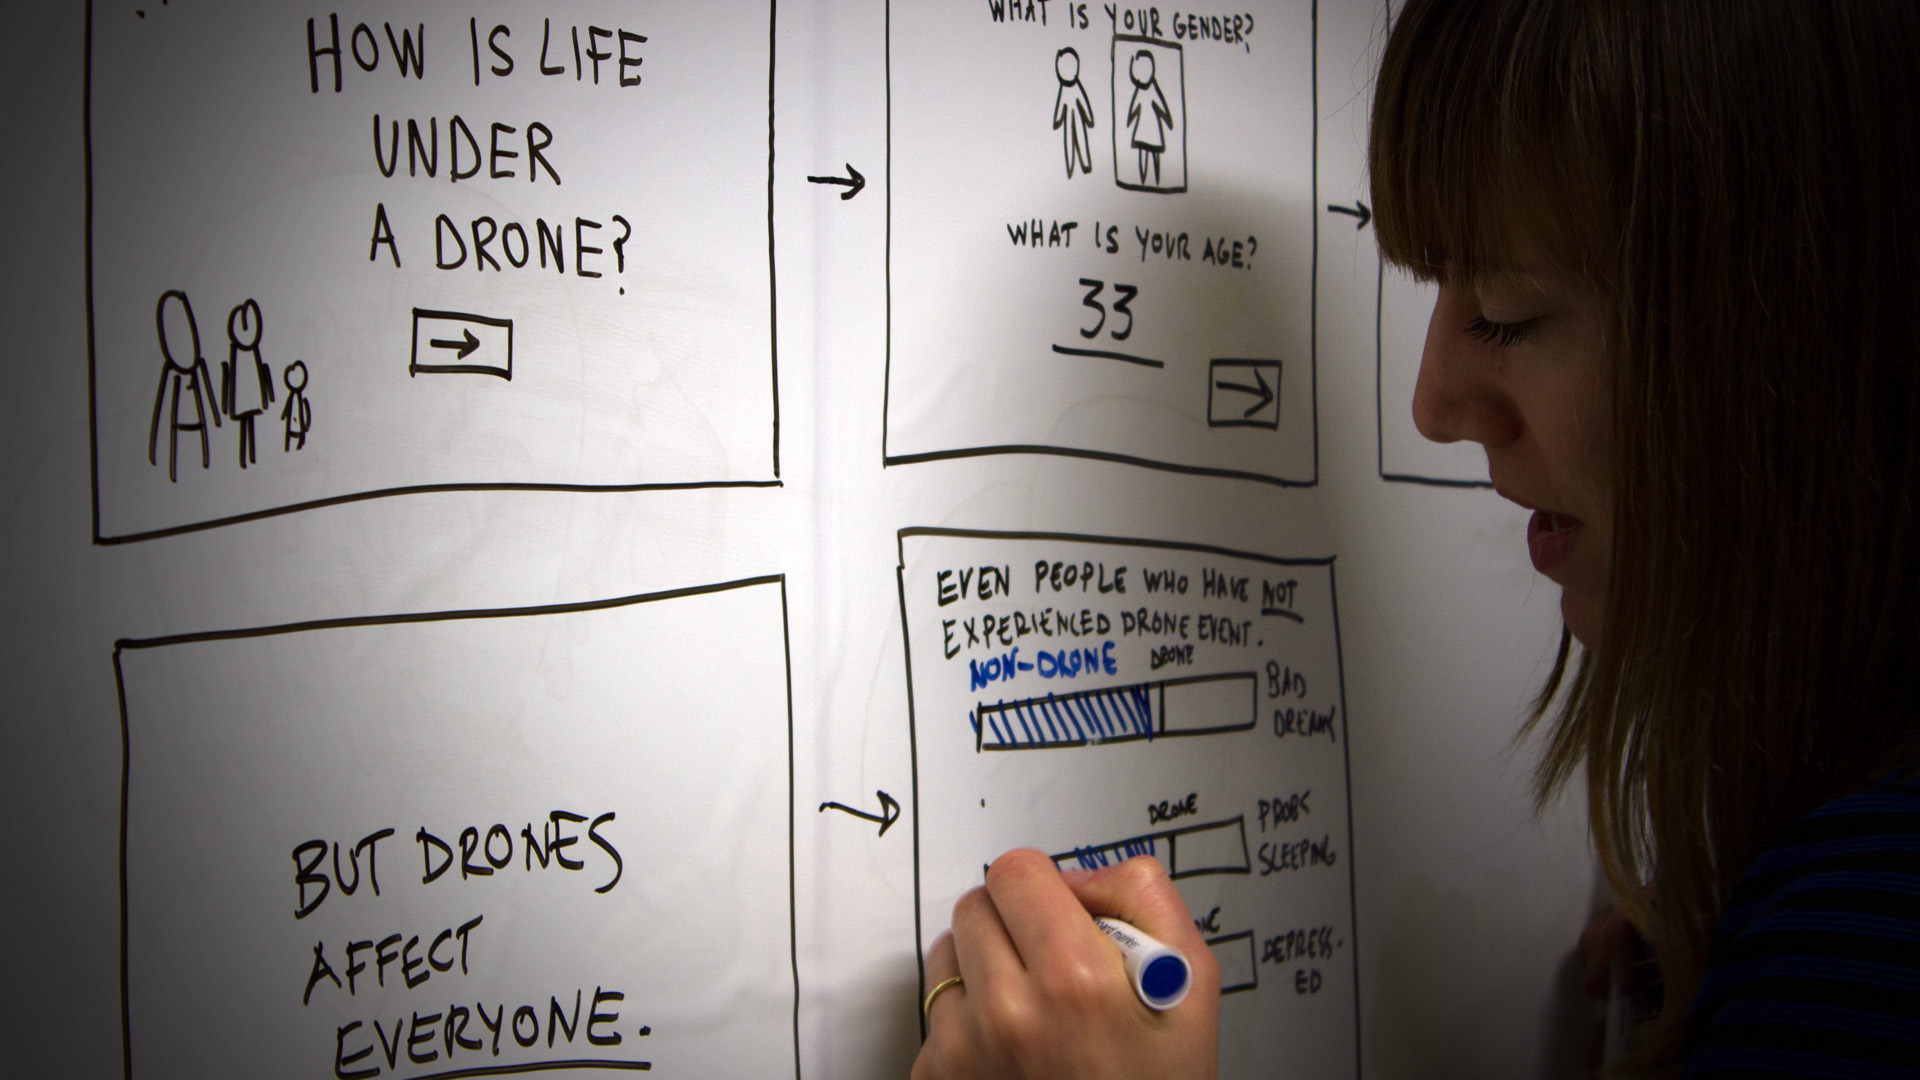 Setef writing drones whiteboard.jpg